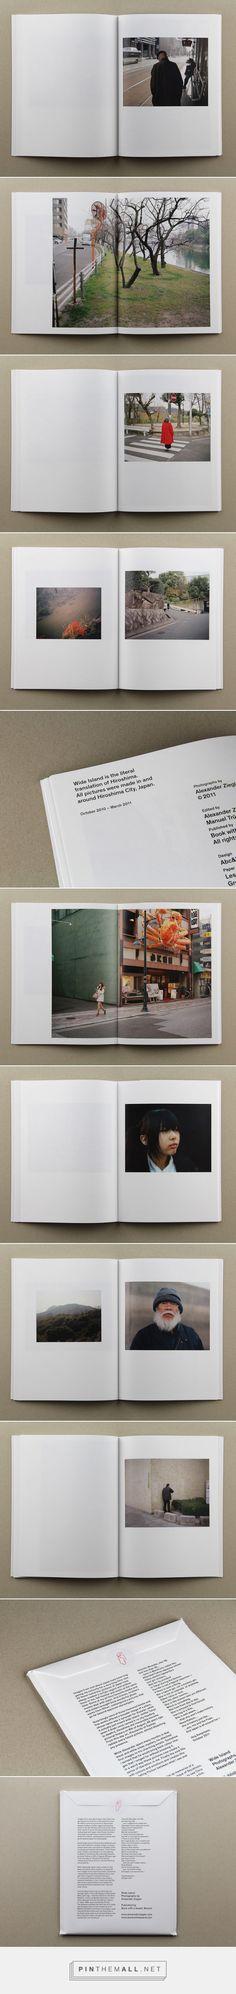 #layout #photobook #book Wide Island by Alexander Ziegler